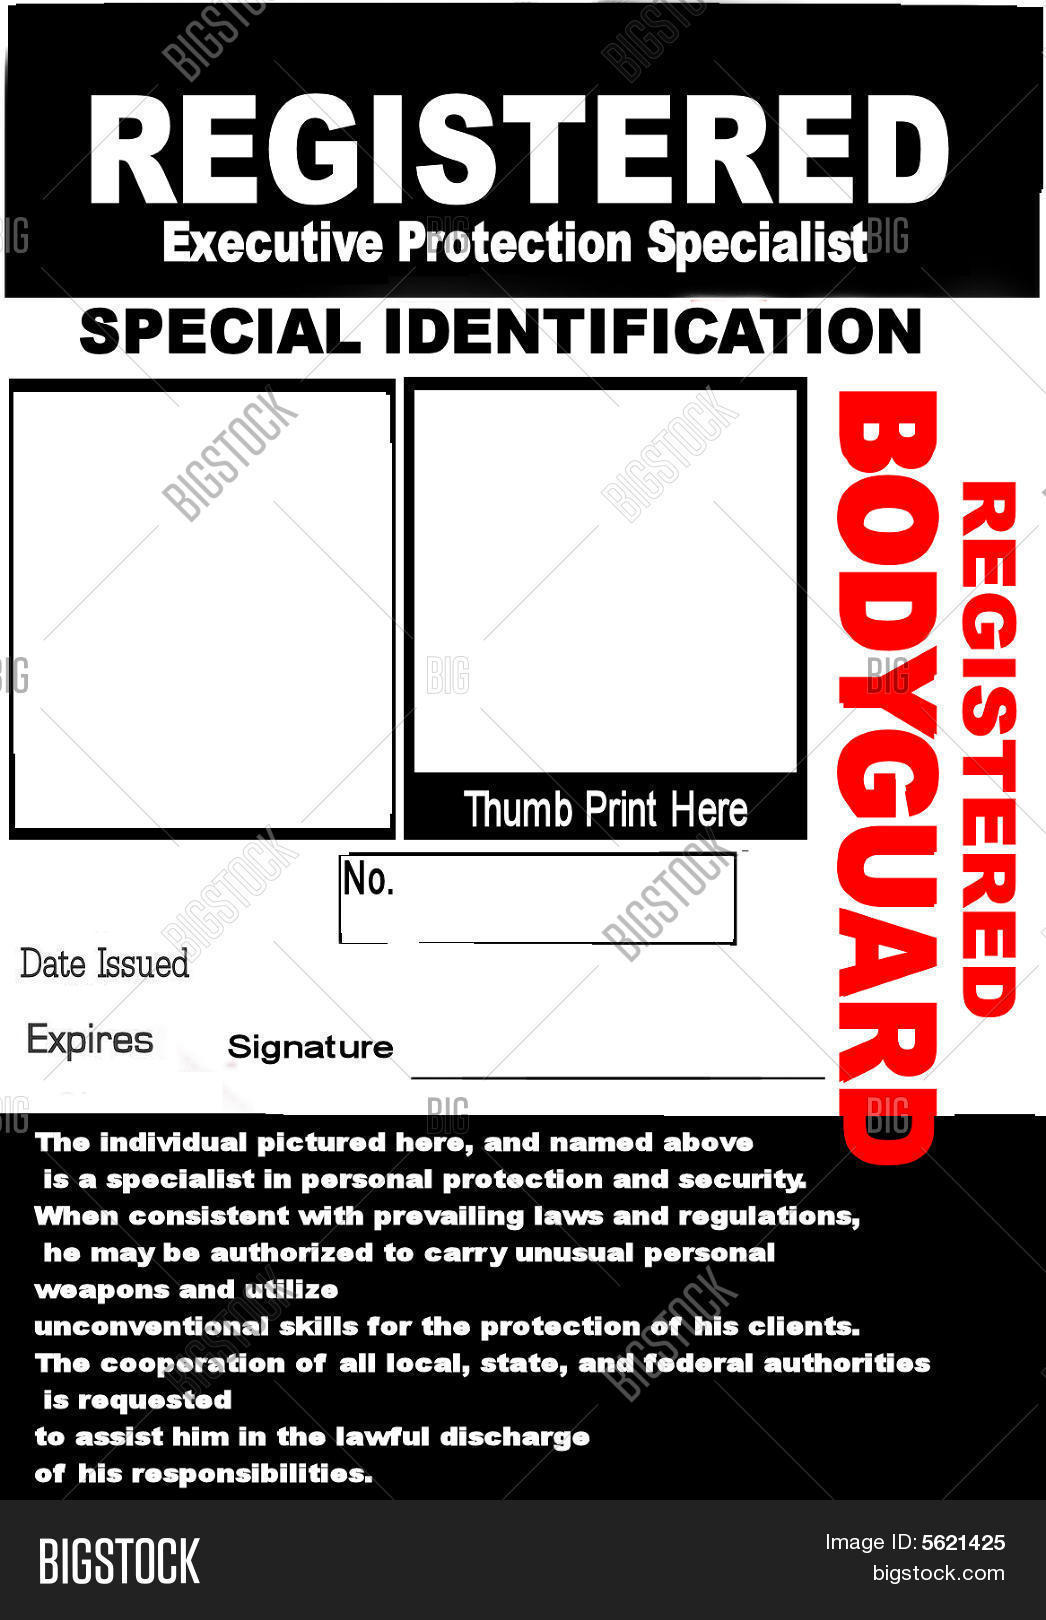 Bodyguard Id Badge Image & Photo (Free Trial)   Bigstock